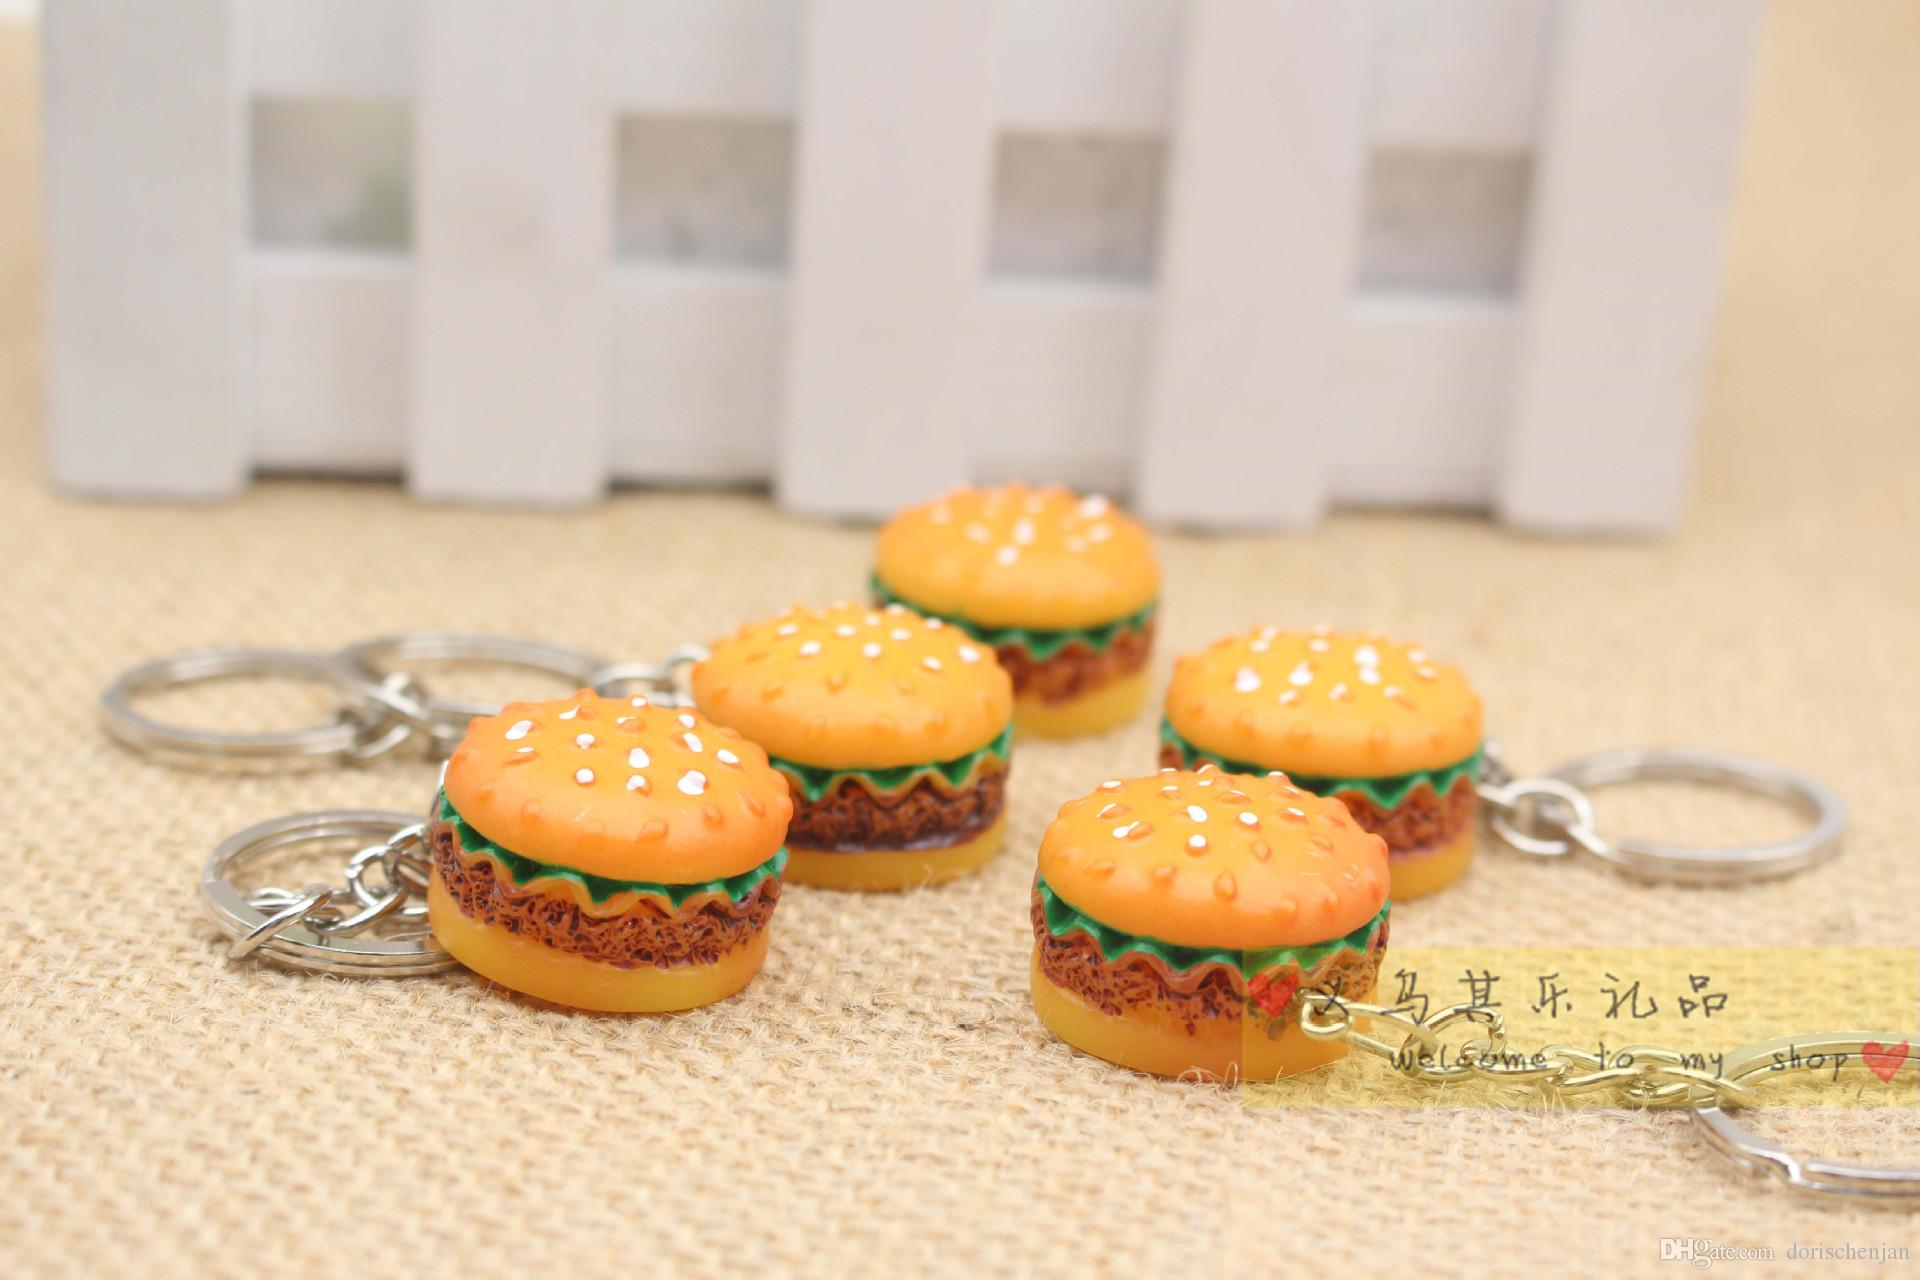 KeyChains Rings bag Trinket Soft ewsin Keychain Minions Marines mini hamburger Key Holder Key Chains Phone Accessories Gift